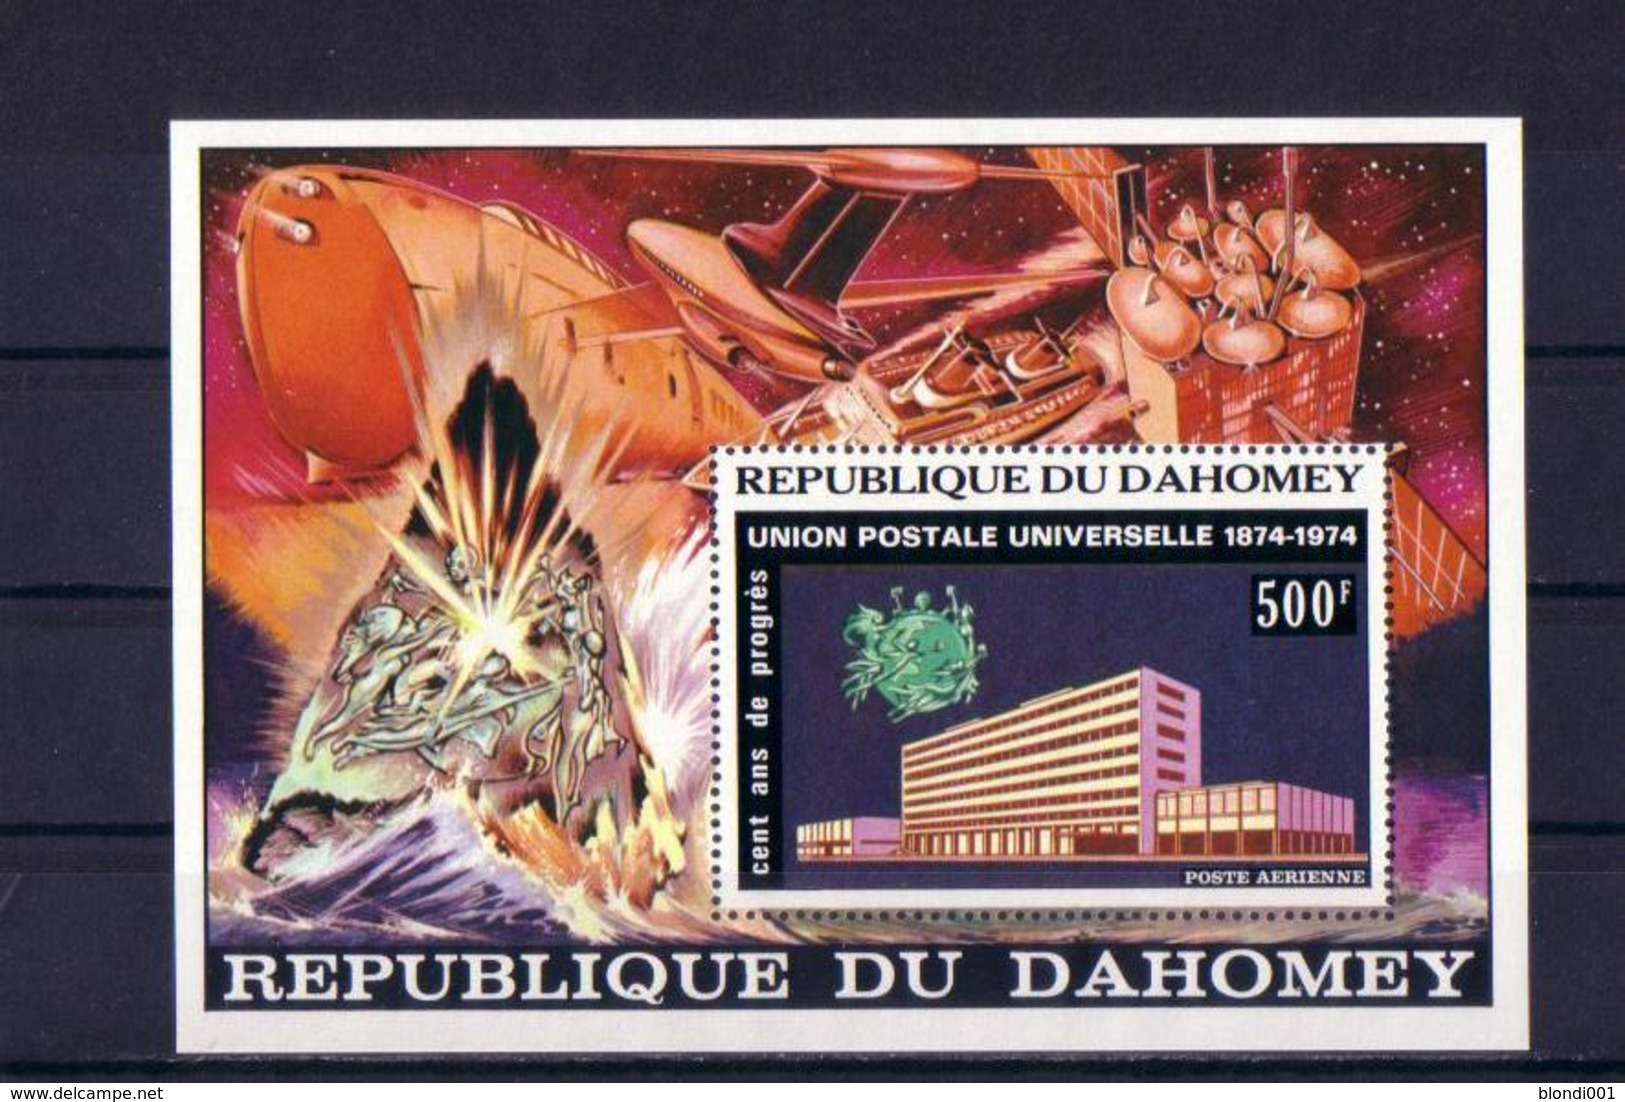 SPACE - UPU - DAHOMEY - S/S MNH - Spazio